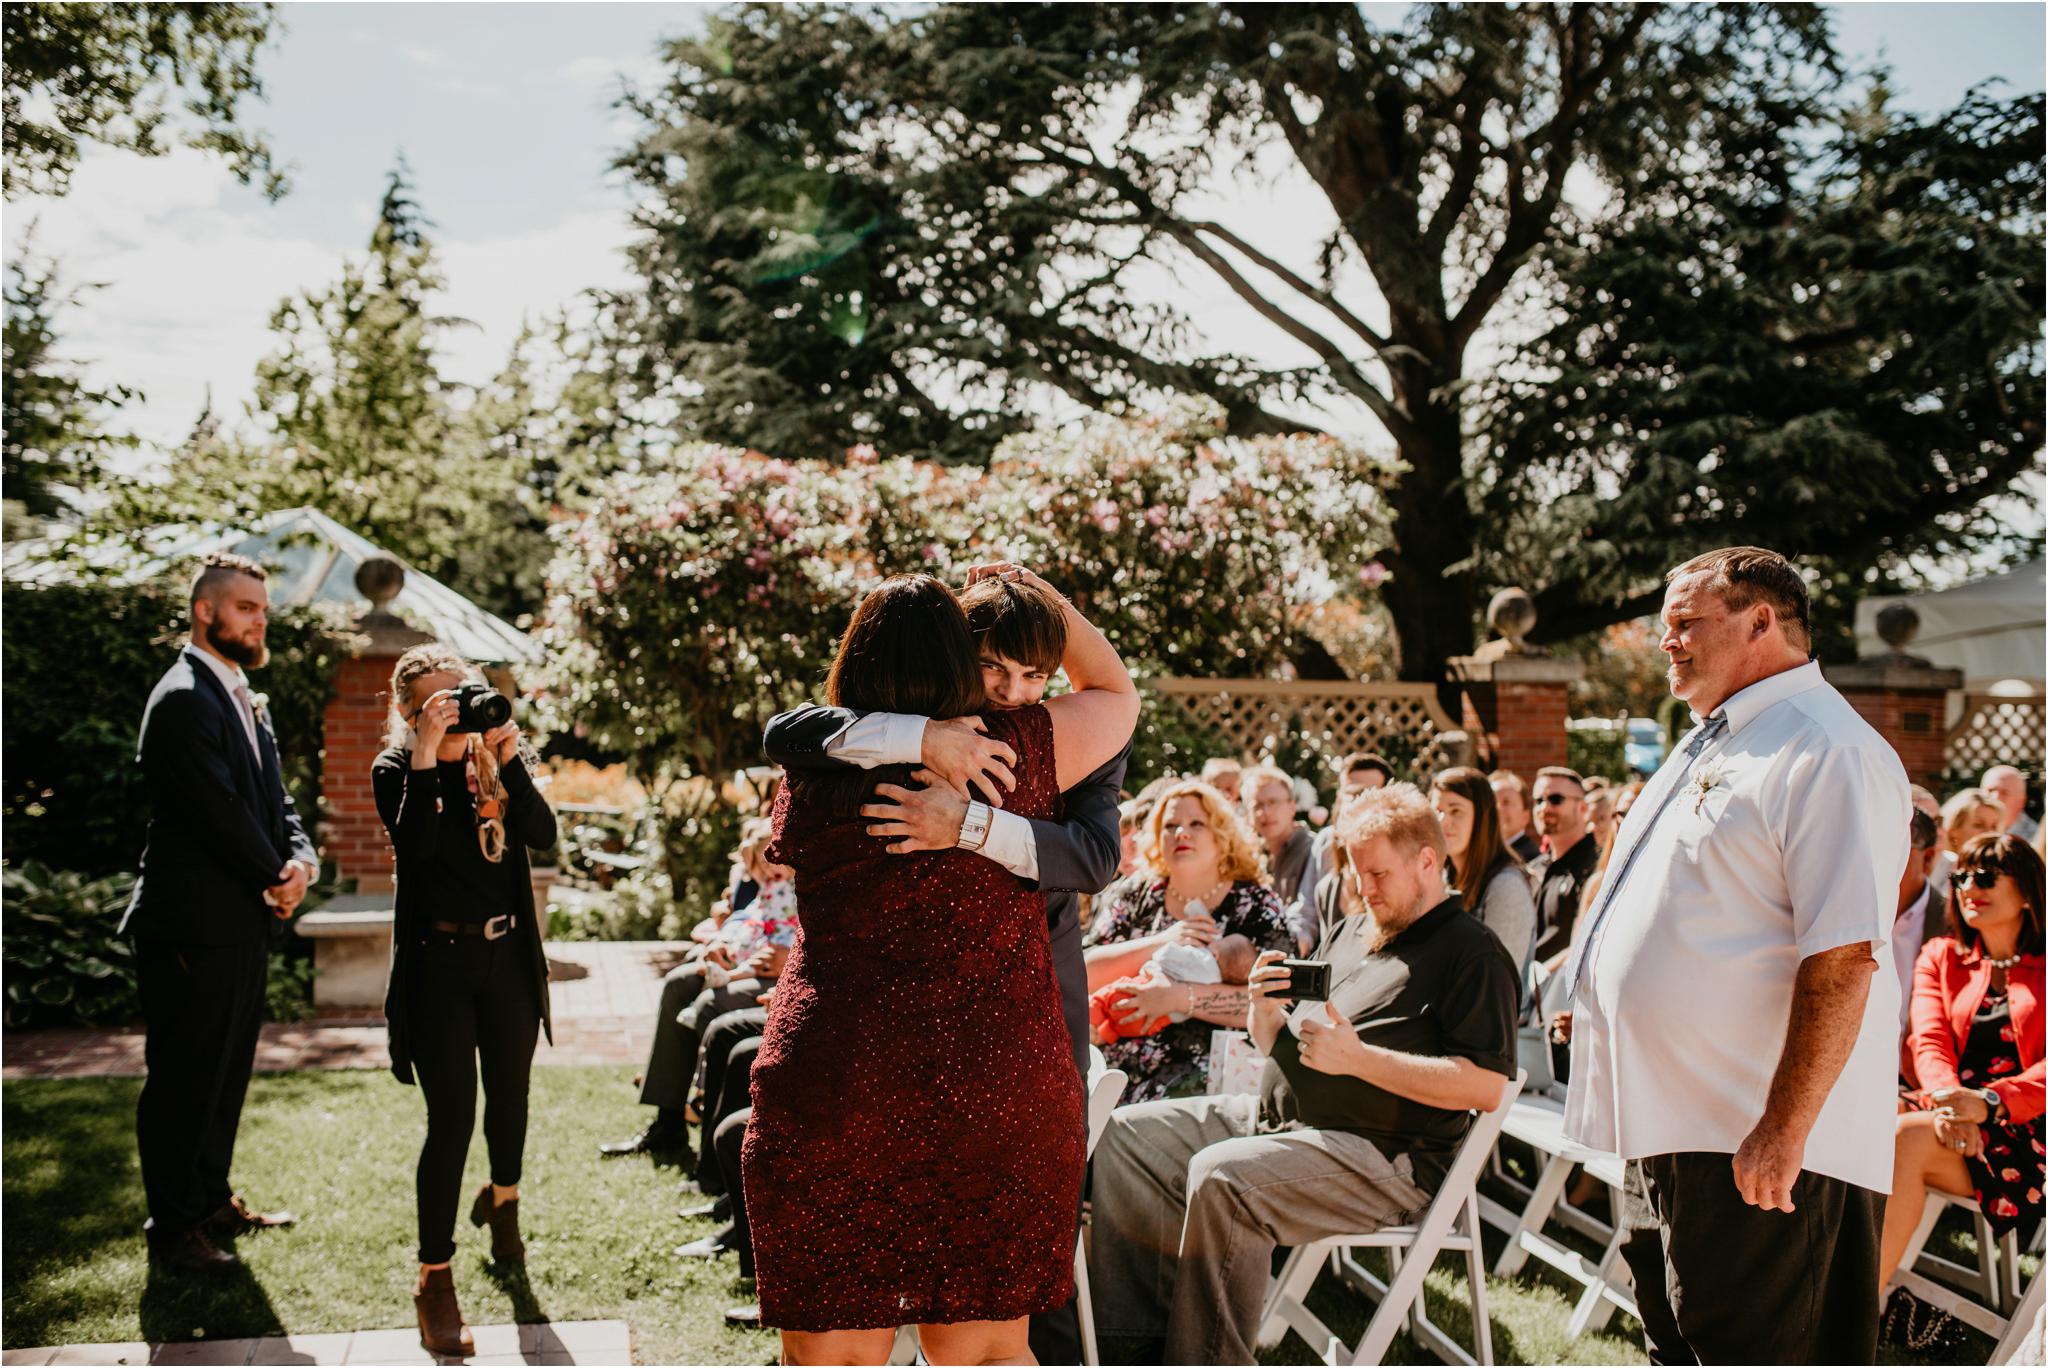 chance-and-ondrea-lairmont-manor-wedding-seattle-photographer-075.jpg